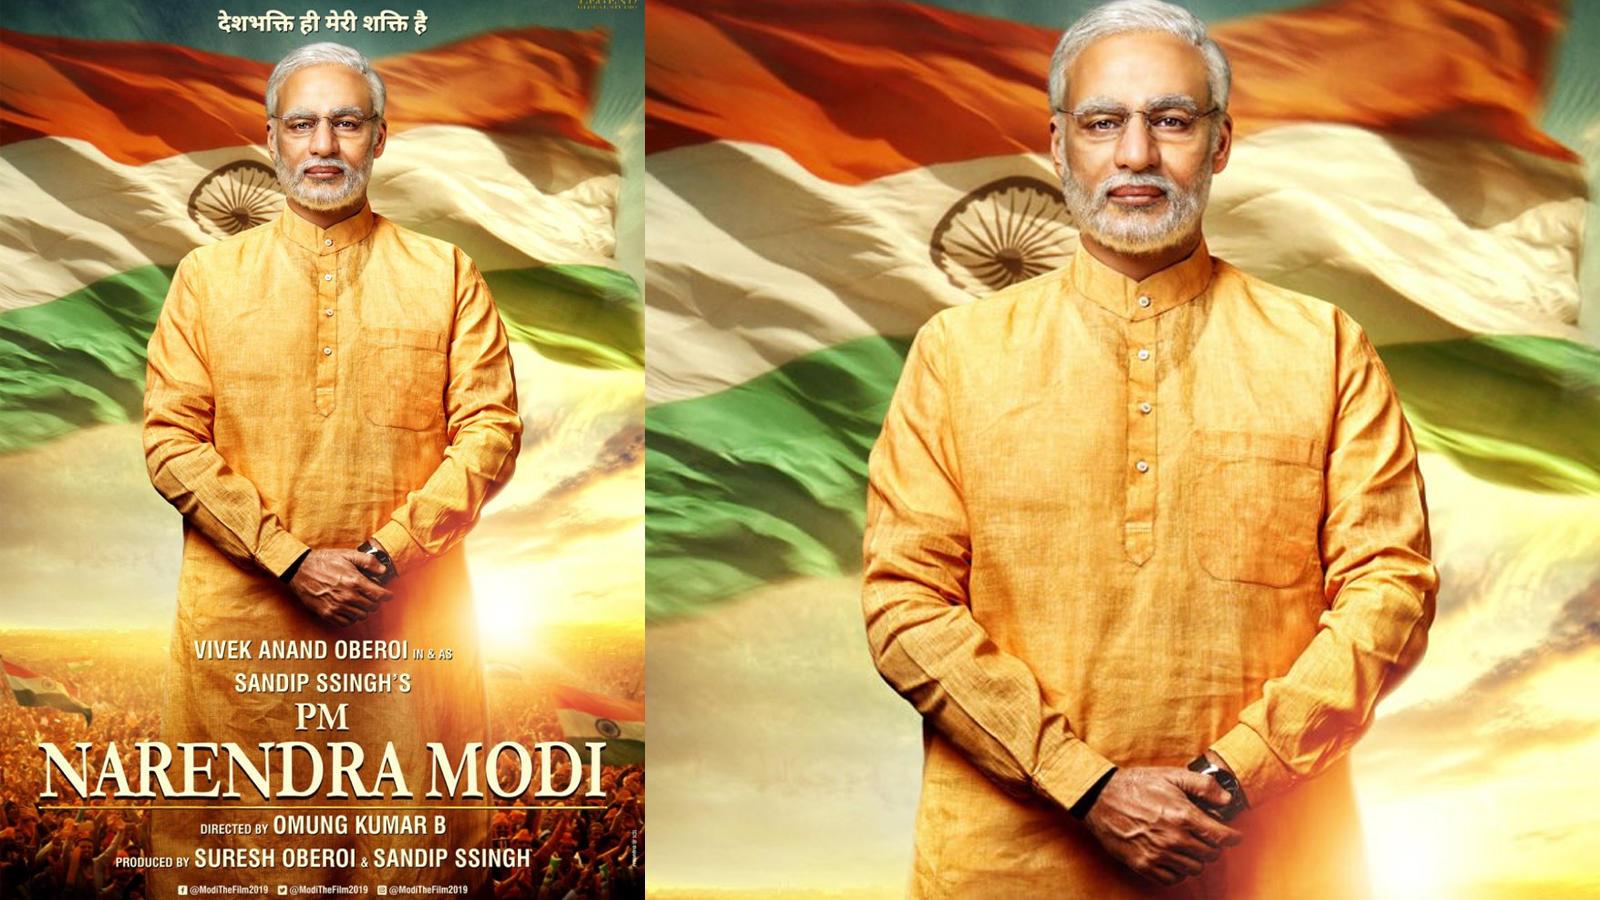 First look of PM Narendra Modi's biopic starring Vivek Oberoi